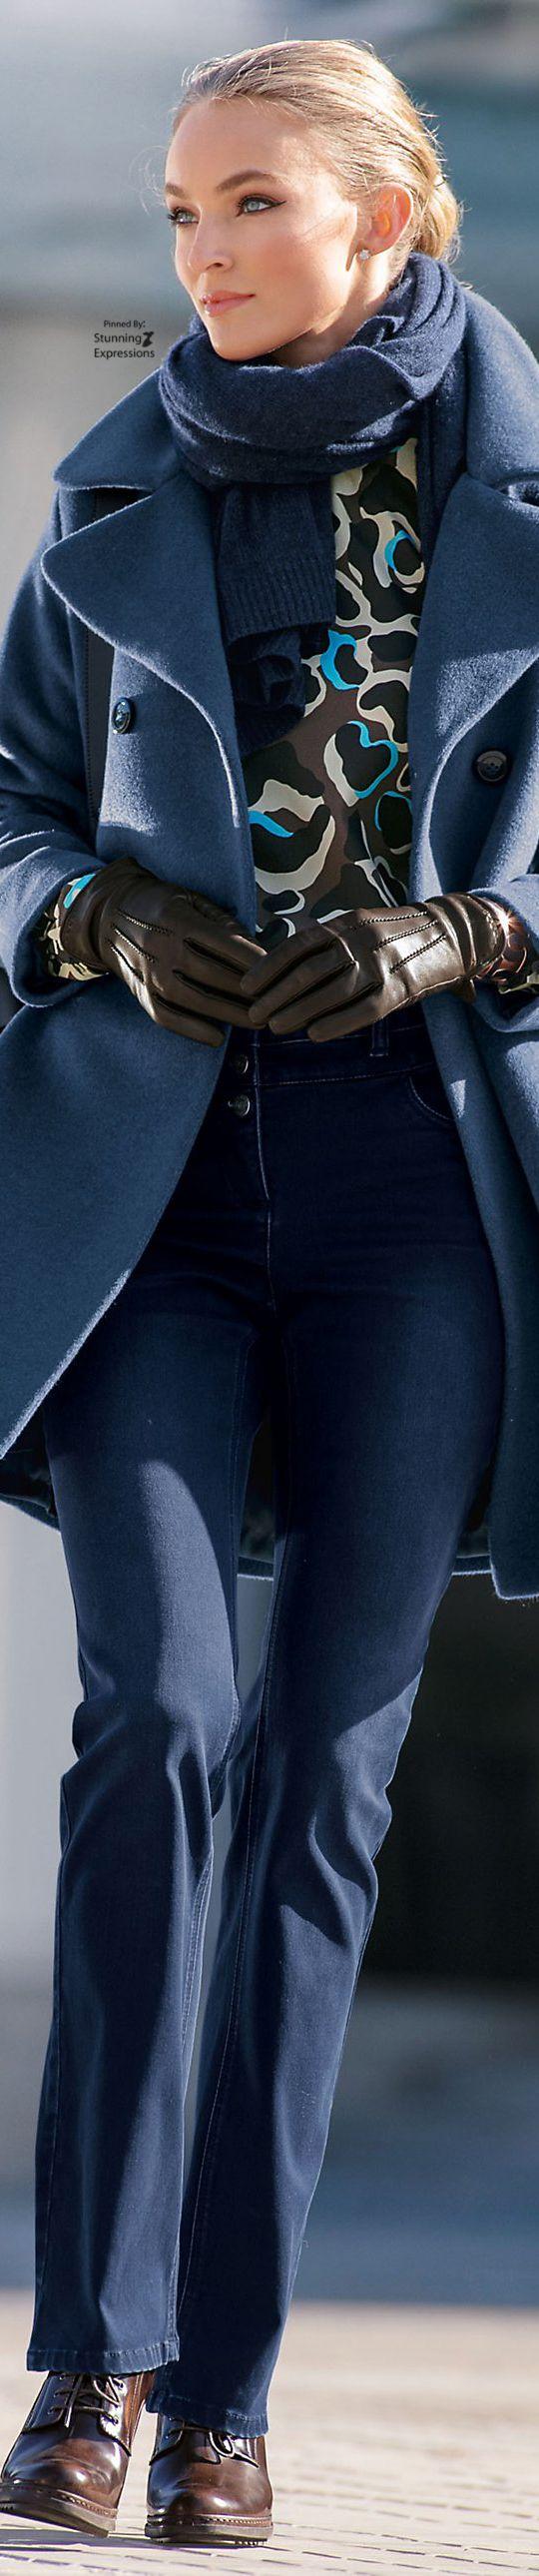 Madeleine  Women's Fashion | #MichaelLouis - www.MichaelLouis.com